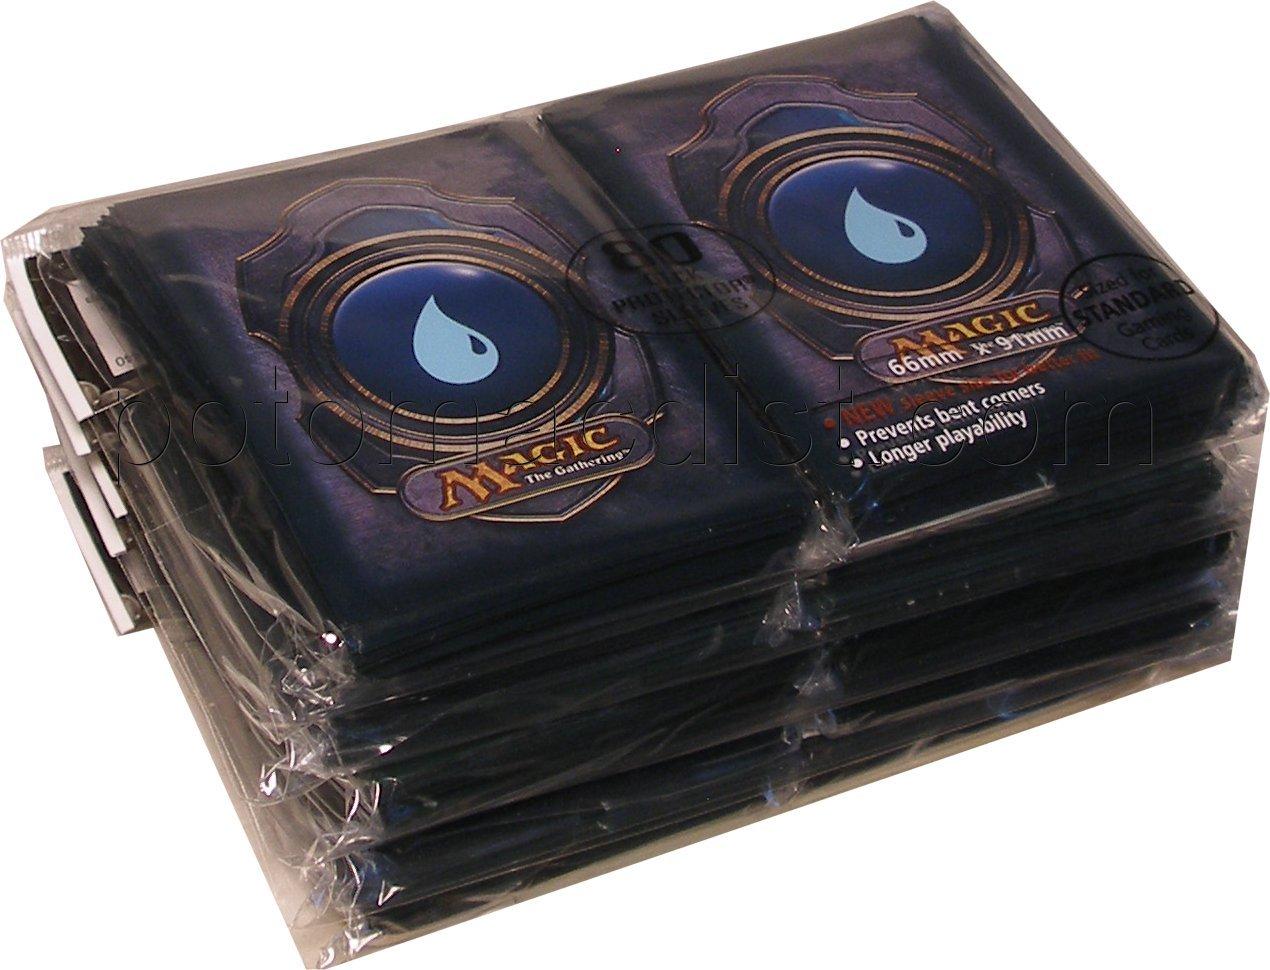 Ultra pro std deck prot mana 3 blue 5 packs potomac mana 3 blue 5 packs potomac distribution biocorpaavc